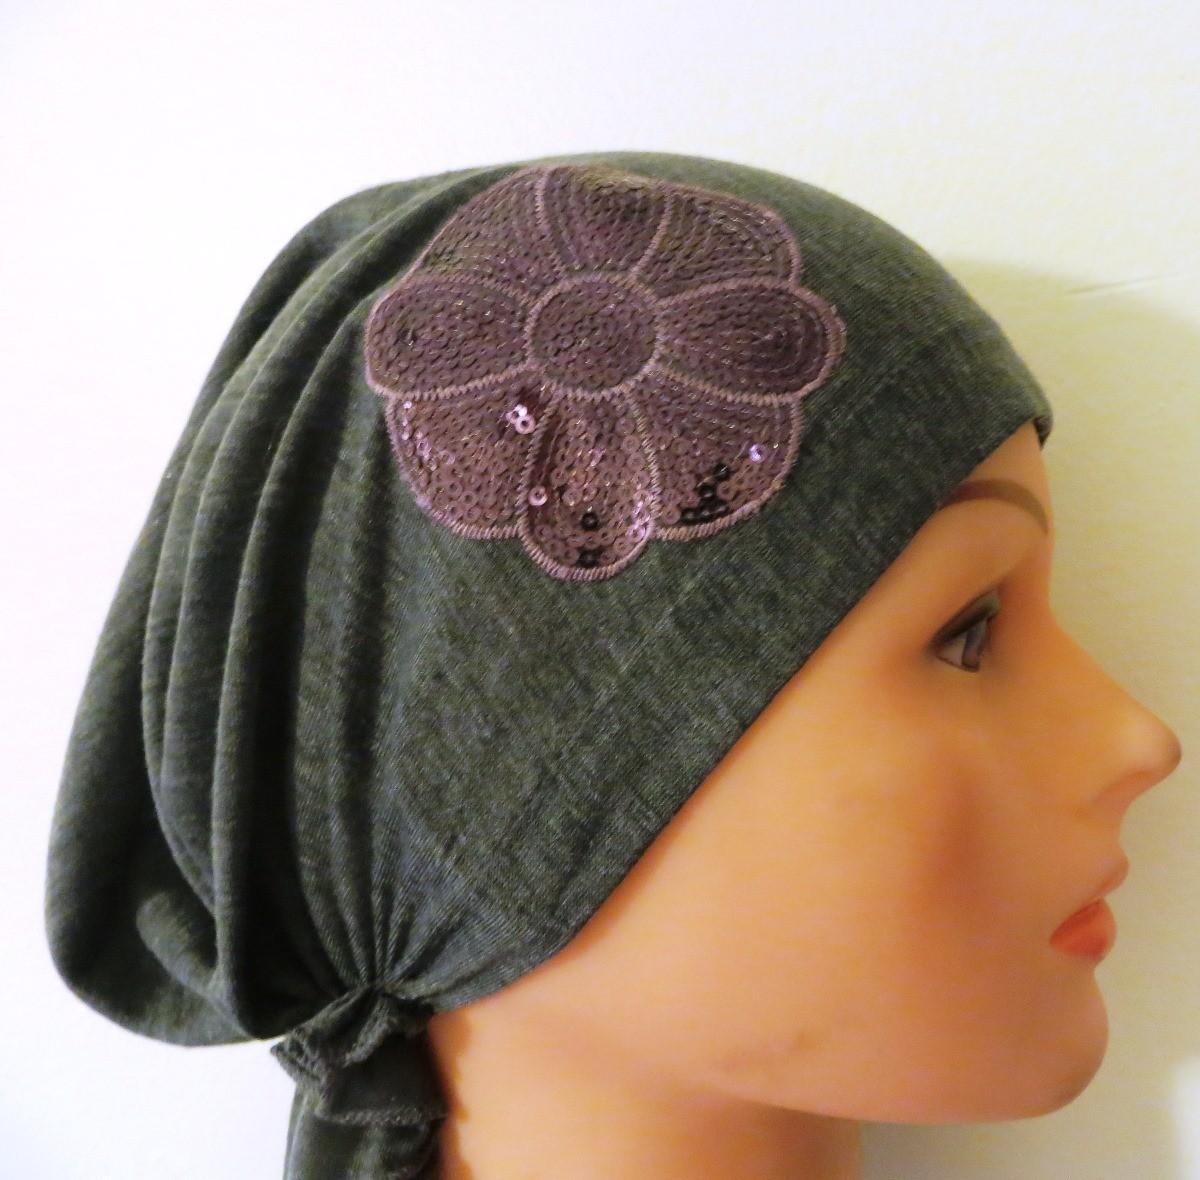 Gray dressy pretied tichel/bandana with lavender applique